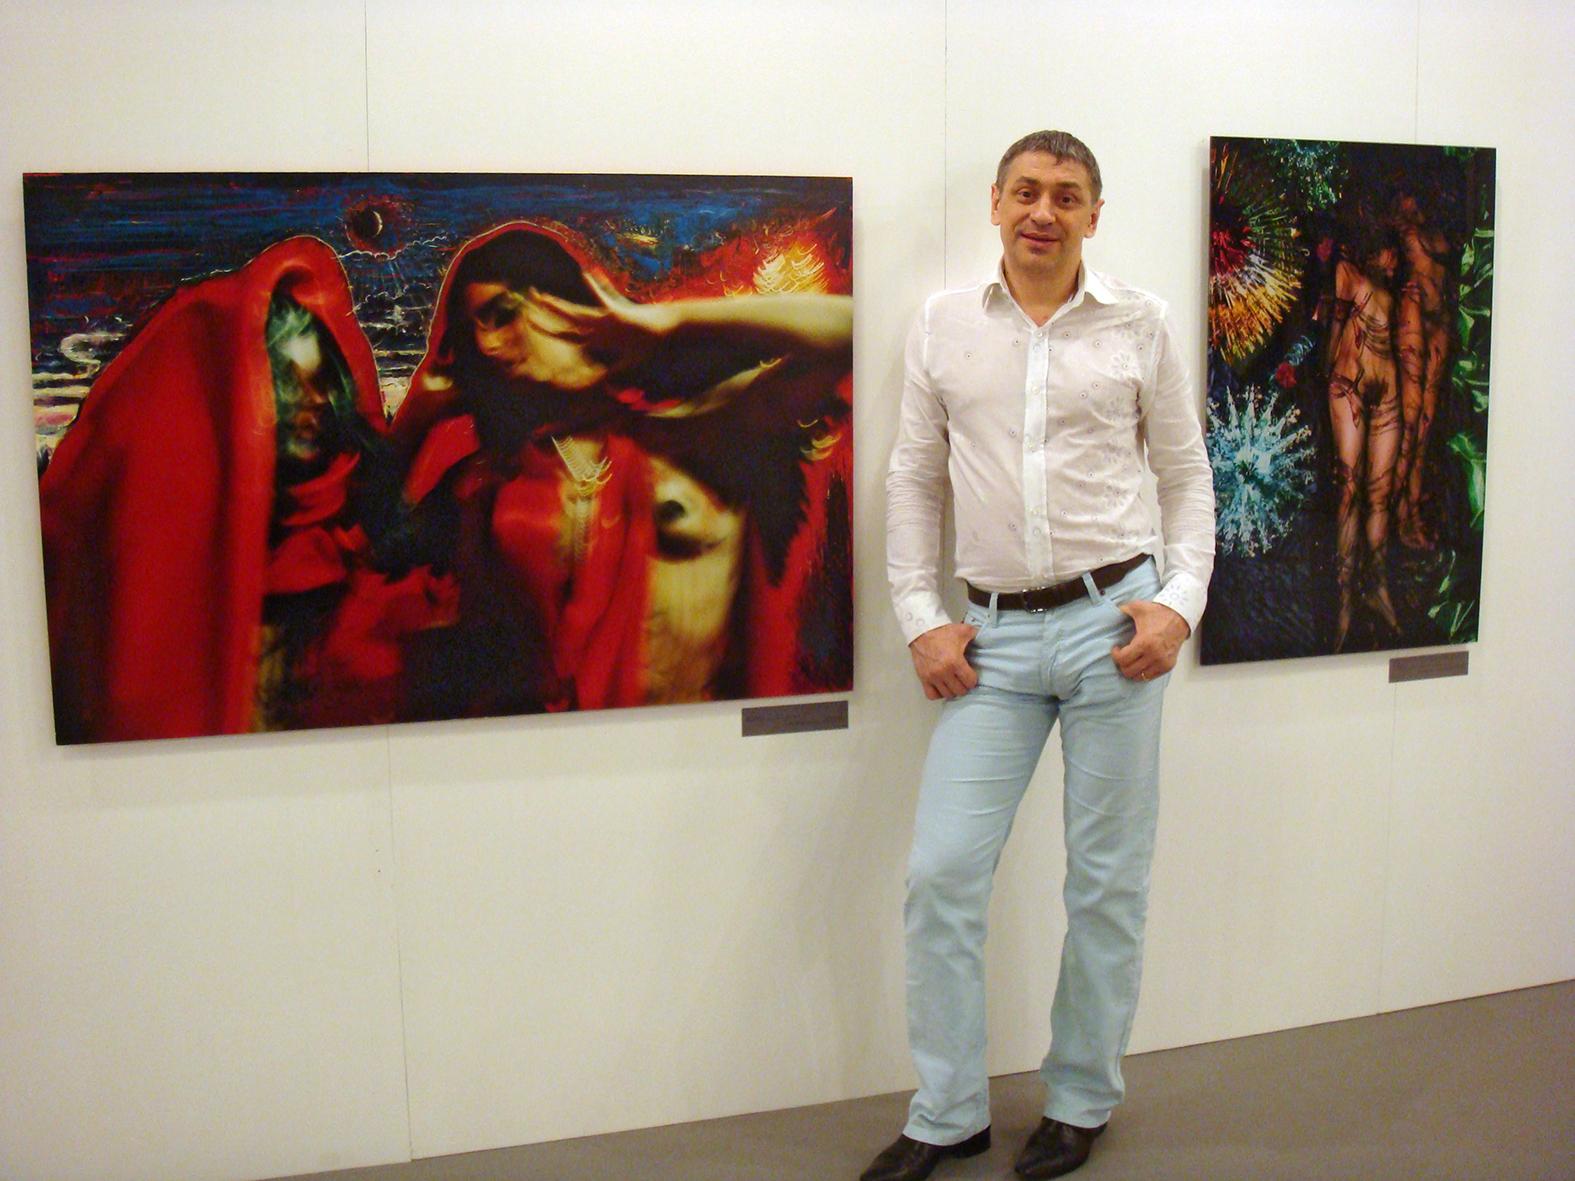 International Art Fair 'Arte Contemporanea Moderna Roma'. Rome, Italy, 2008. At the stand.